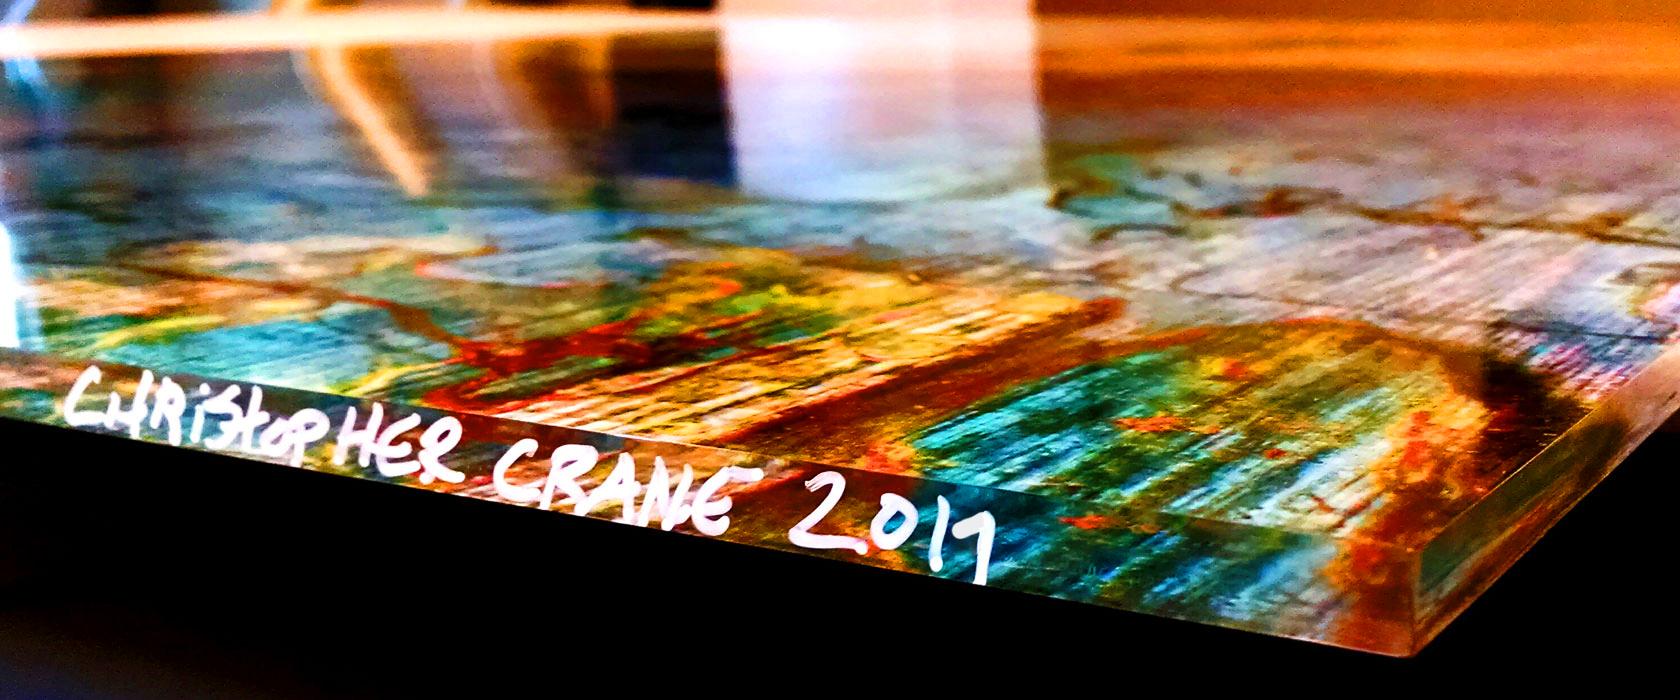 Chris_crane_gallery_abstract_signature_woodbolt_art_corporate_art_abstract_artist_texas_v2